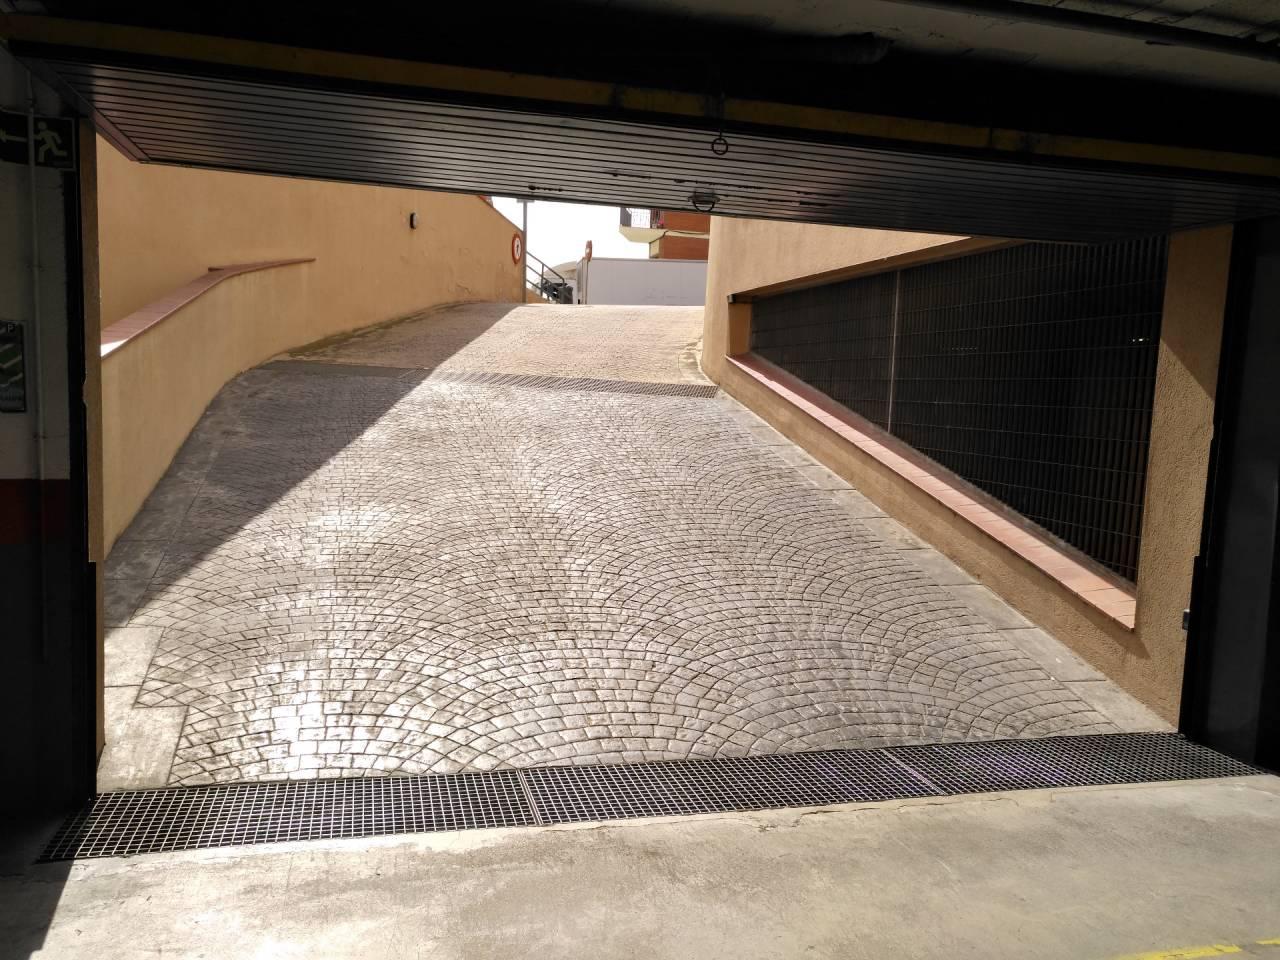 Posto auto  Avenida josep fontcuberta. Superf. 11 m²